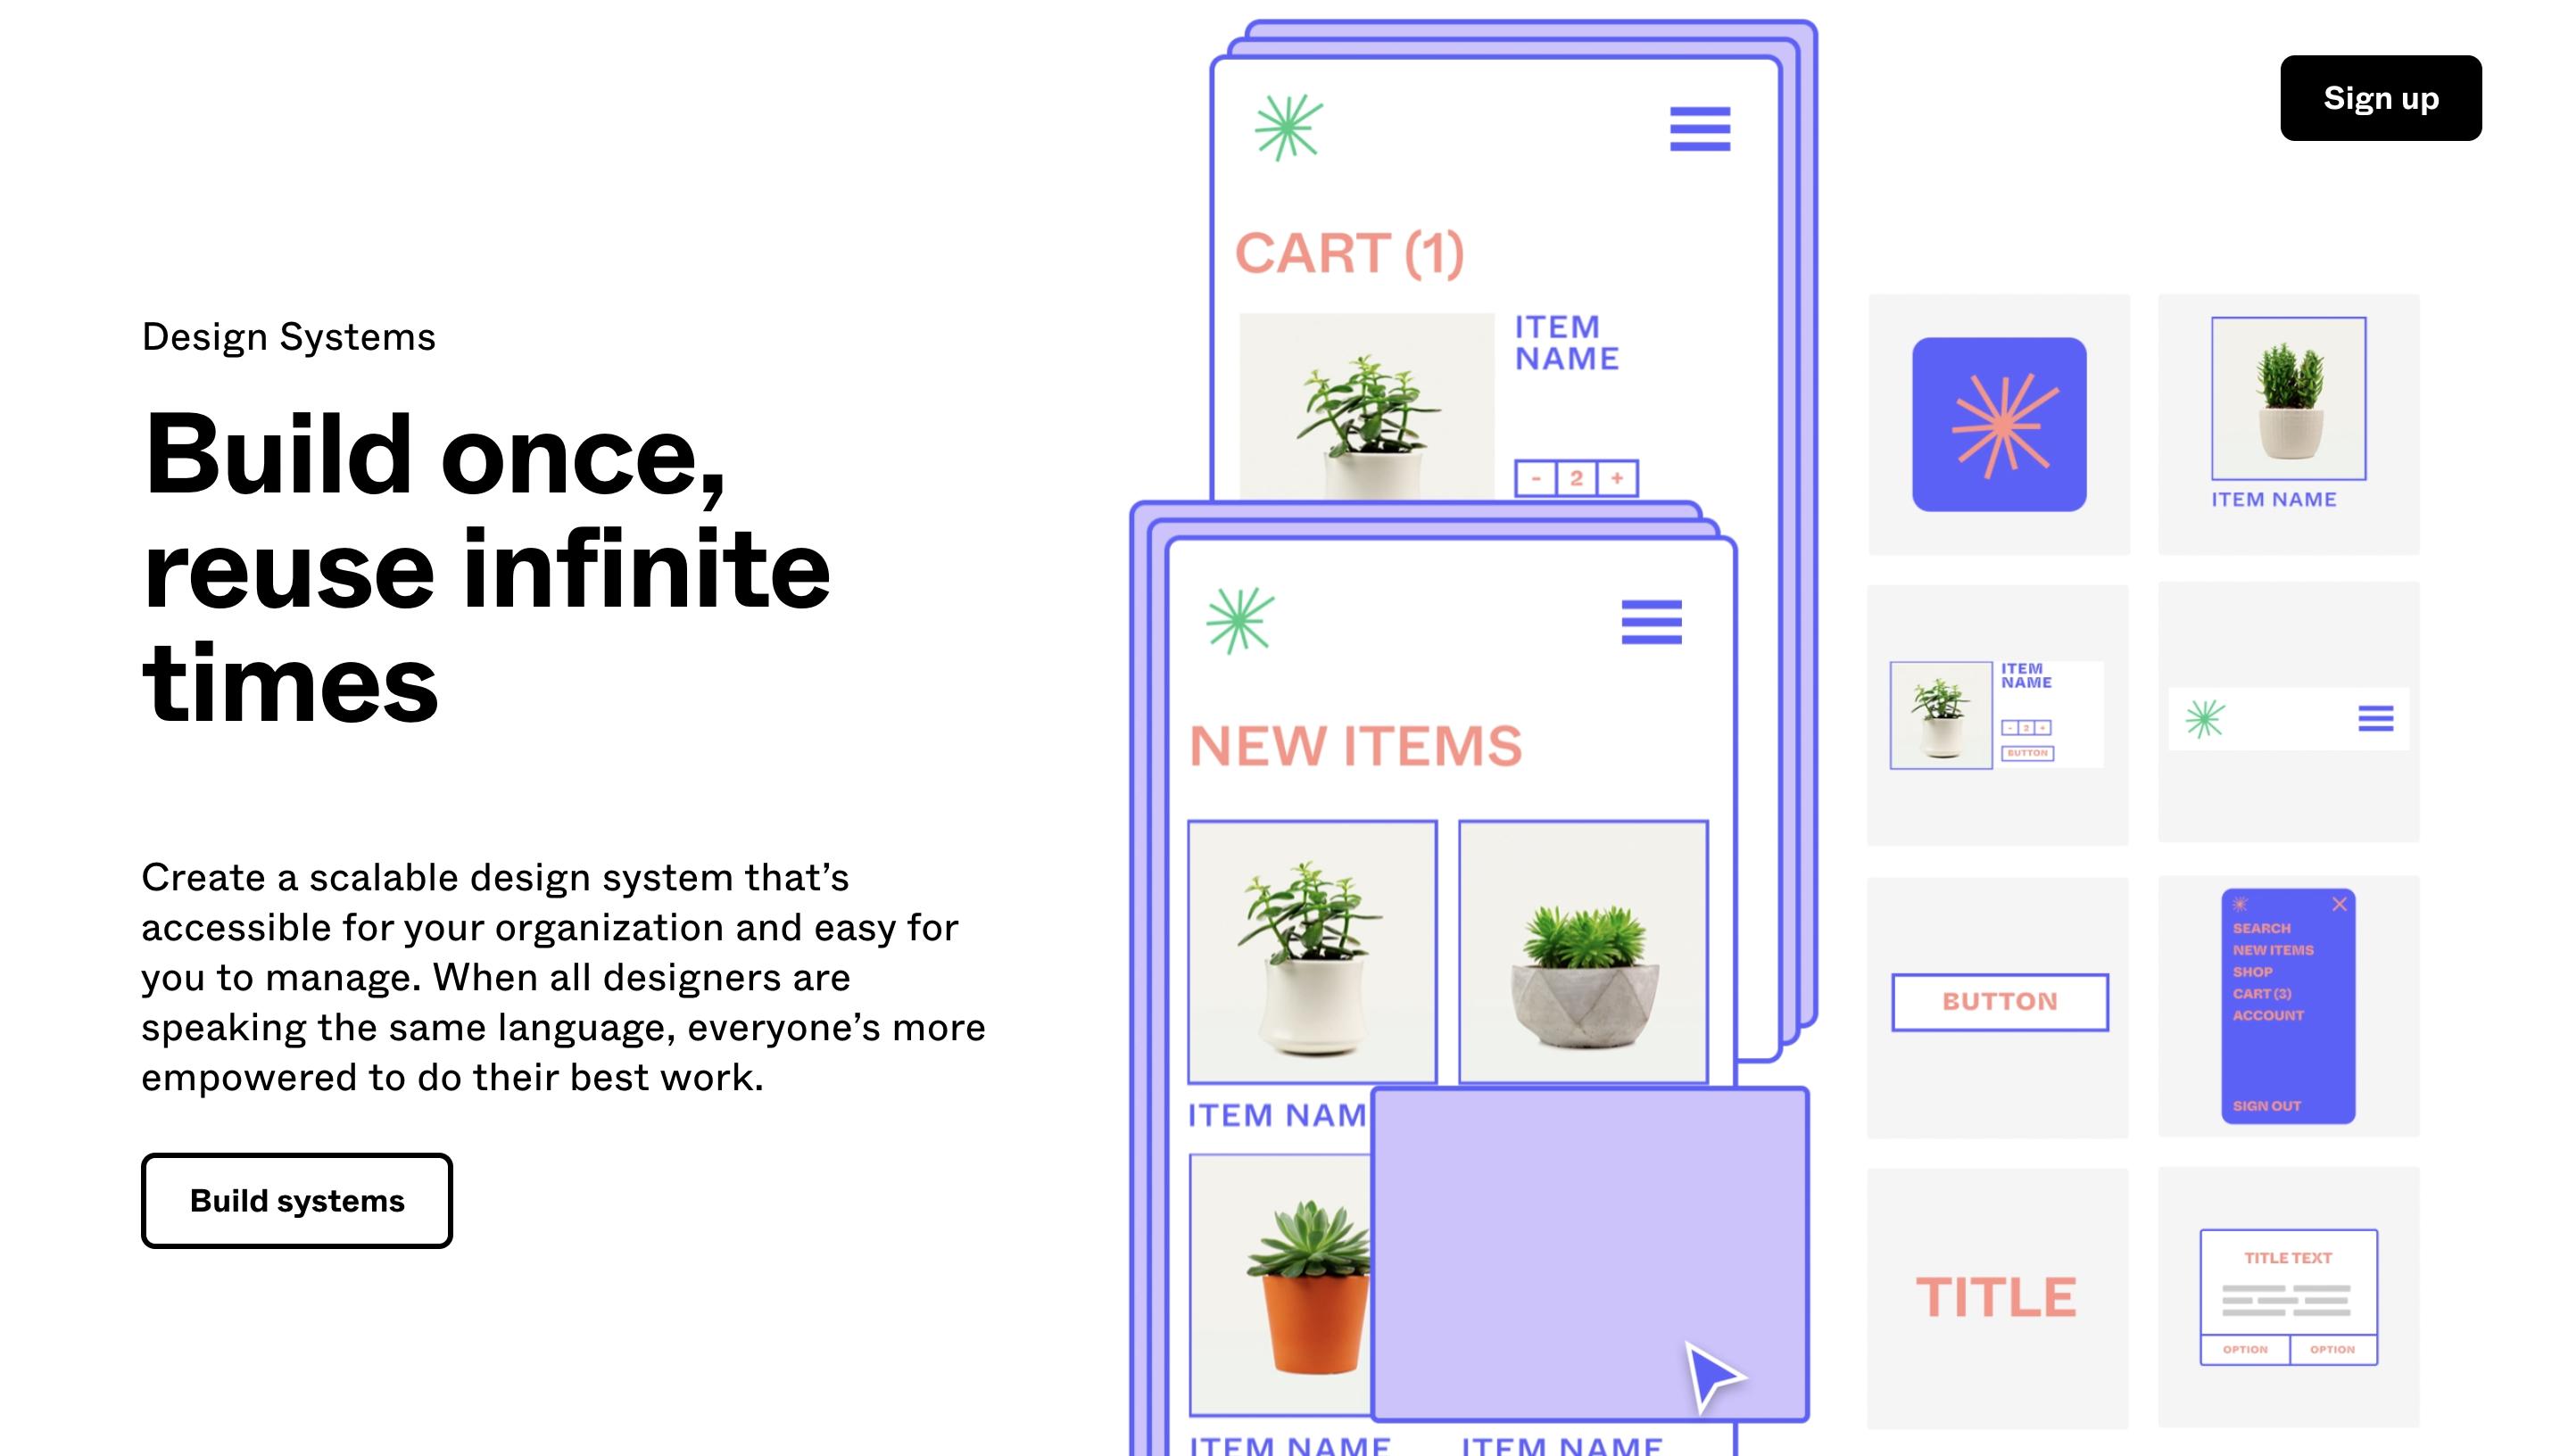 repetition in Figma's web design